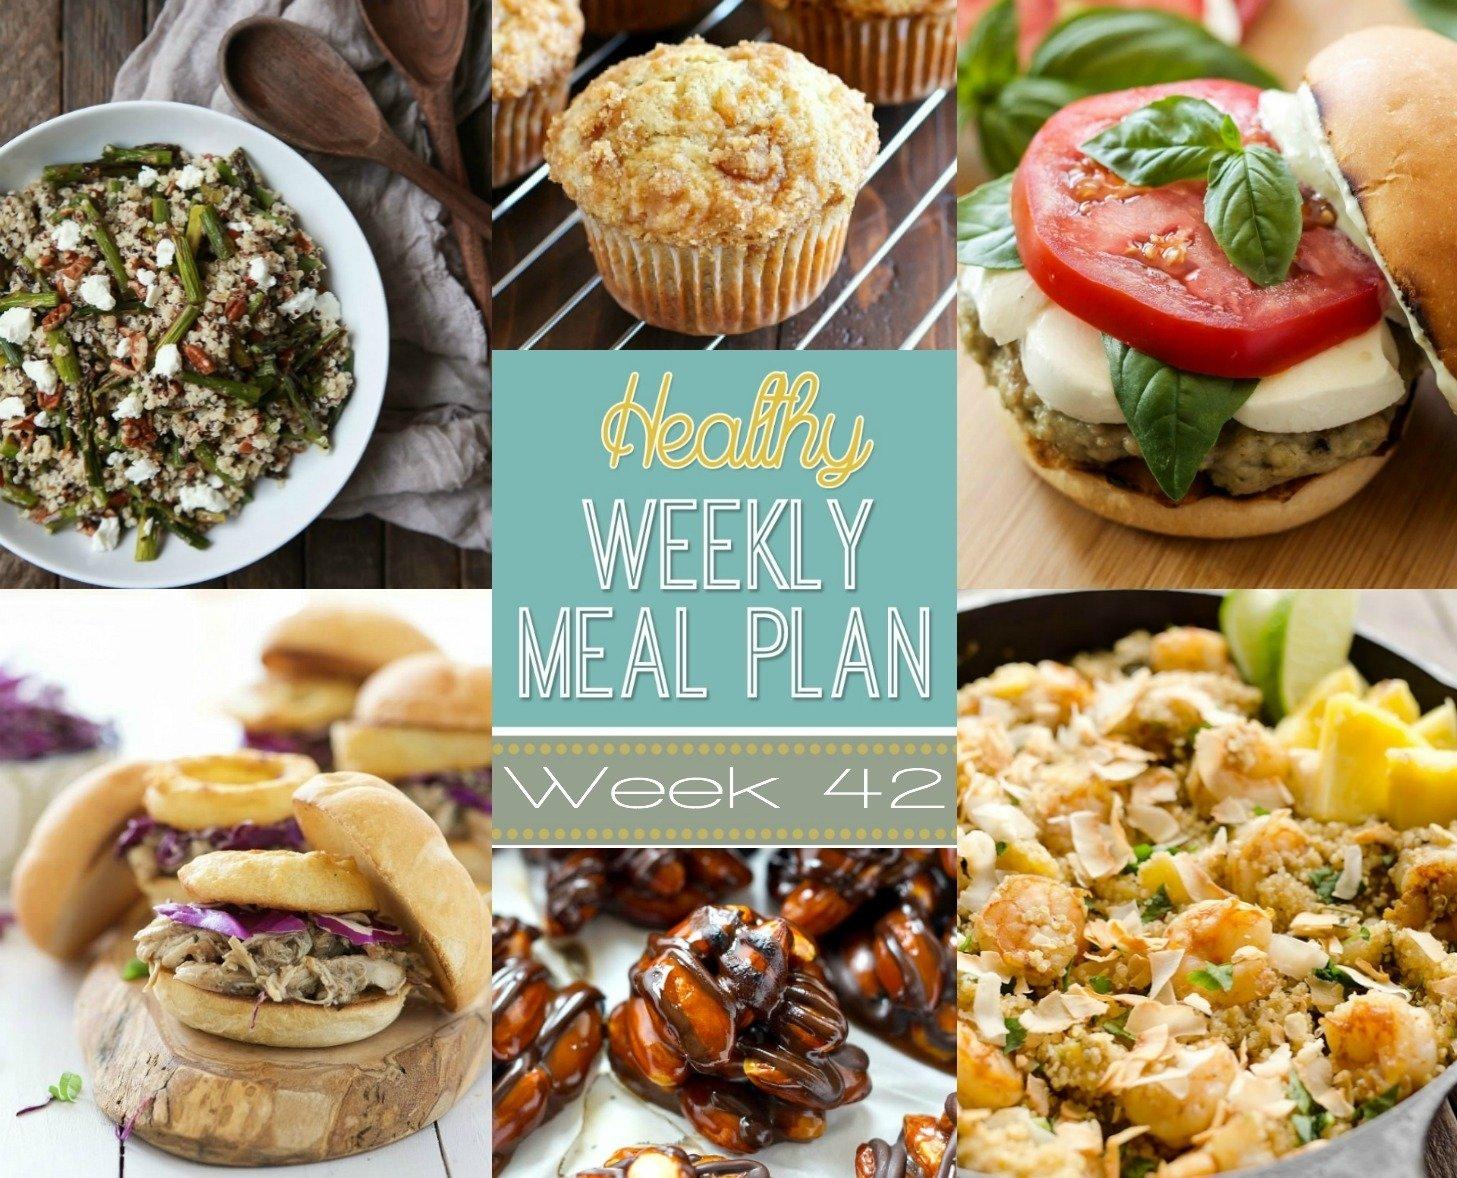 10 Ideal Easy Dinner Ideas For 2 healthy weekly meal plan week 42 2021